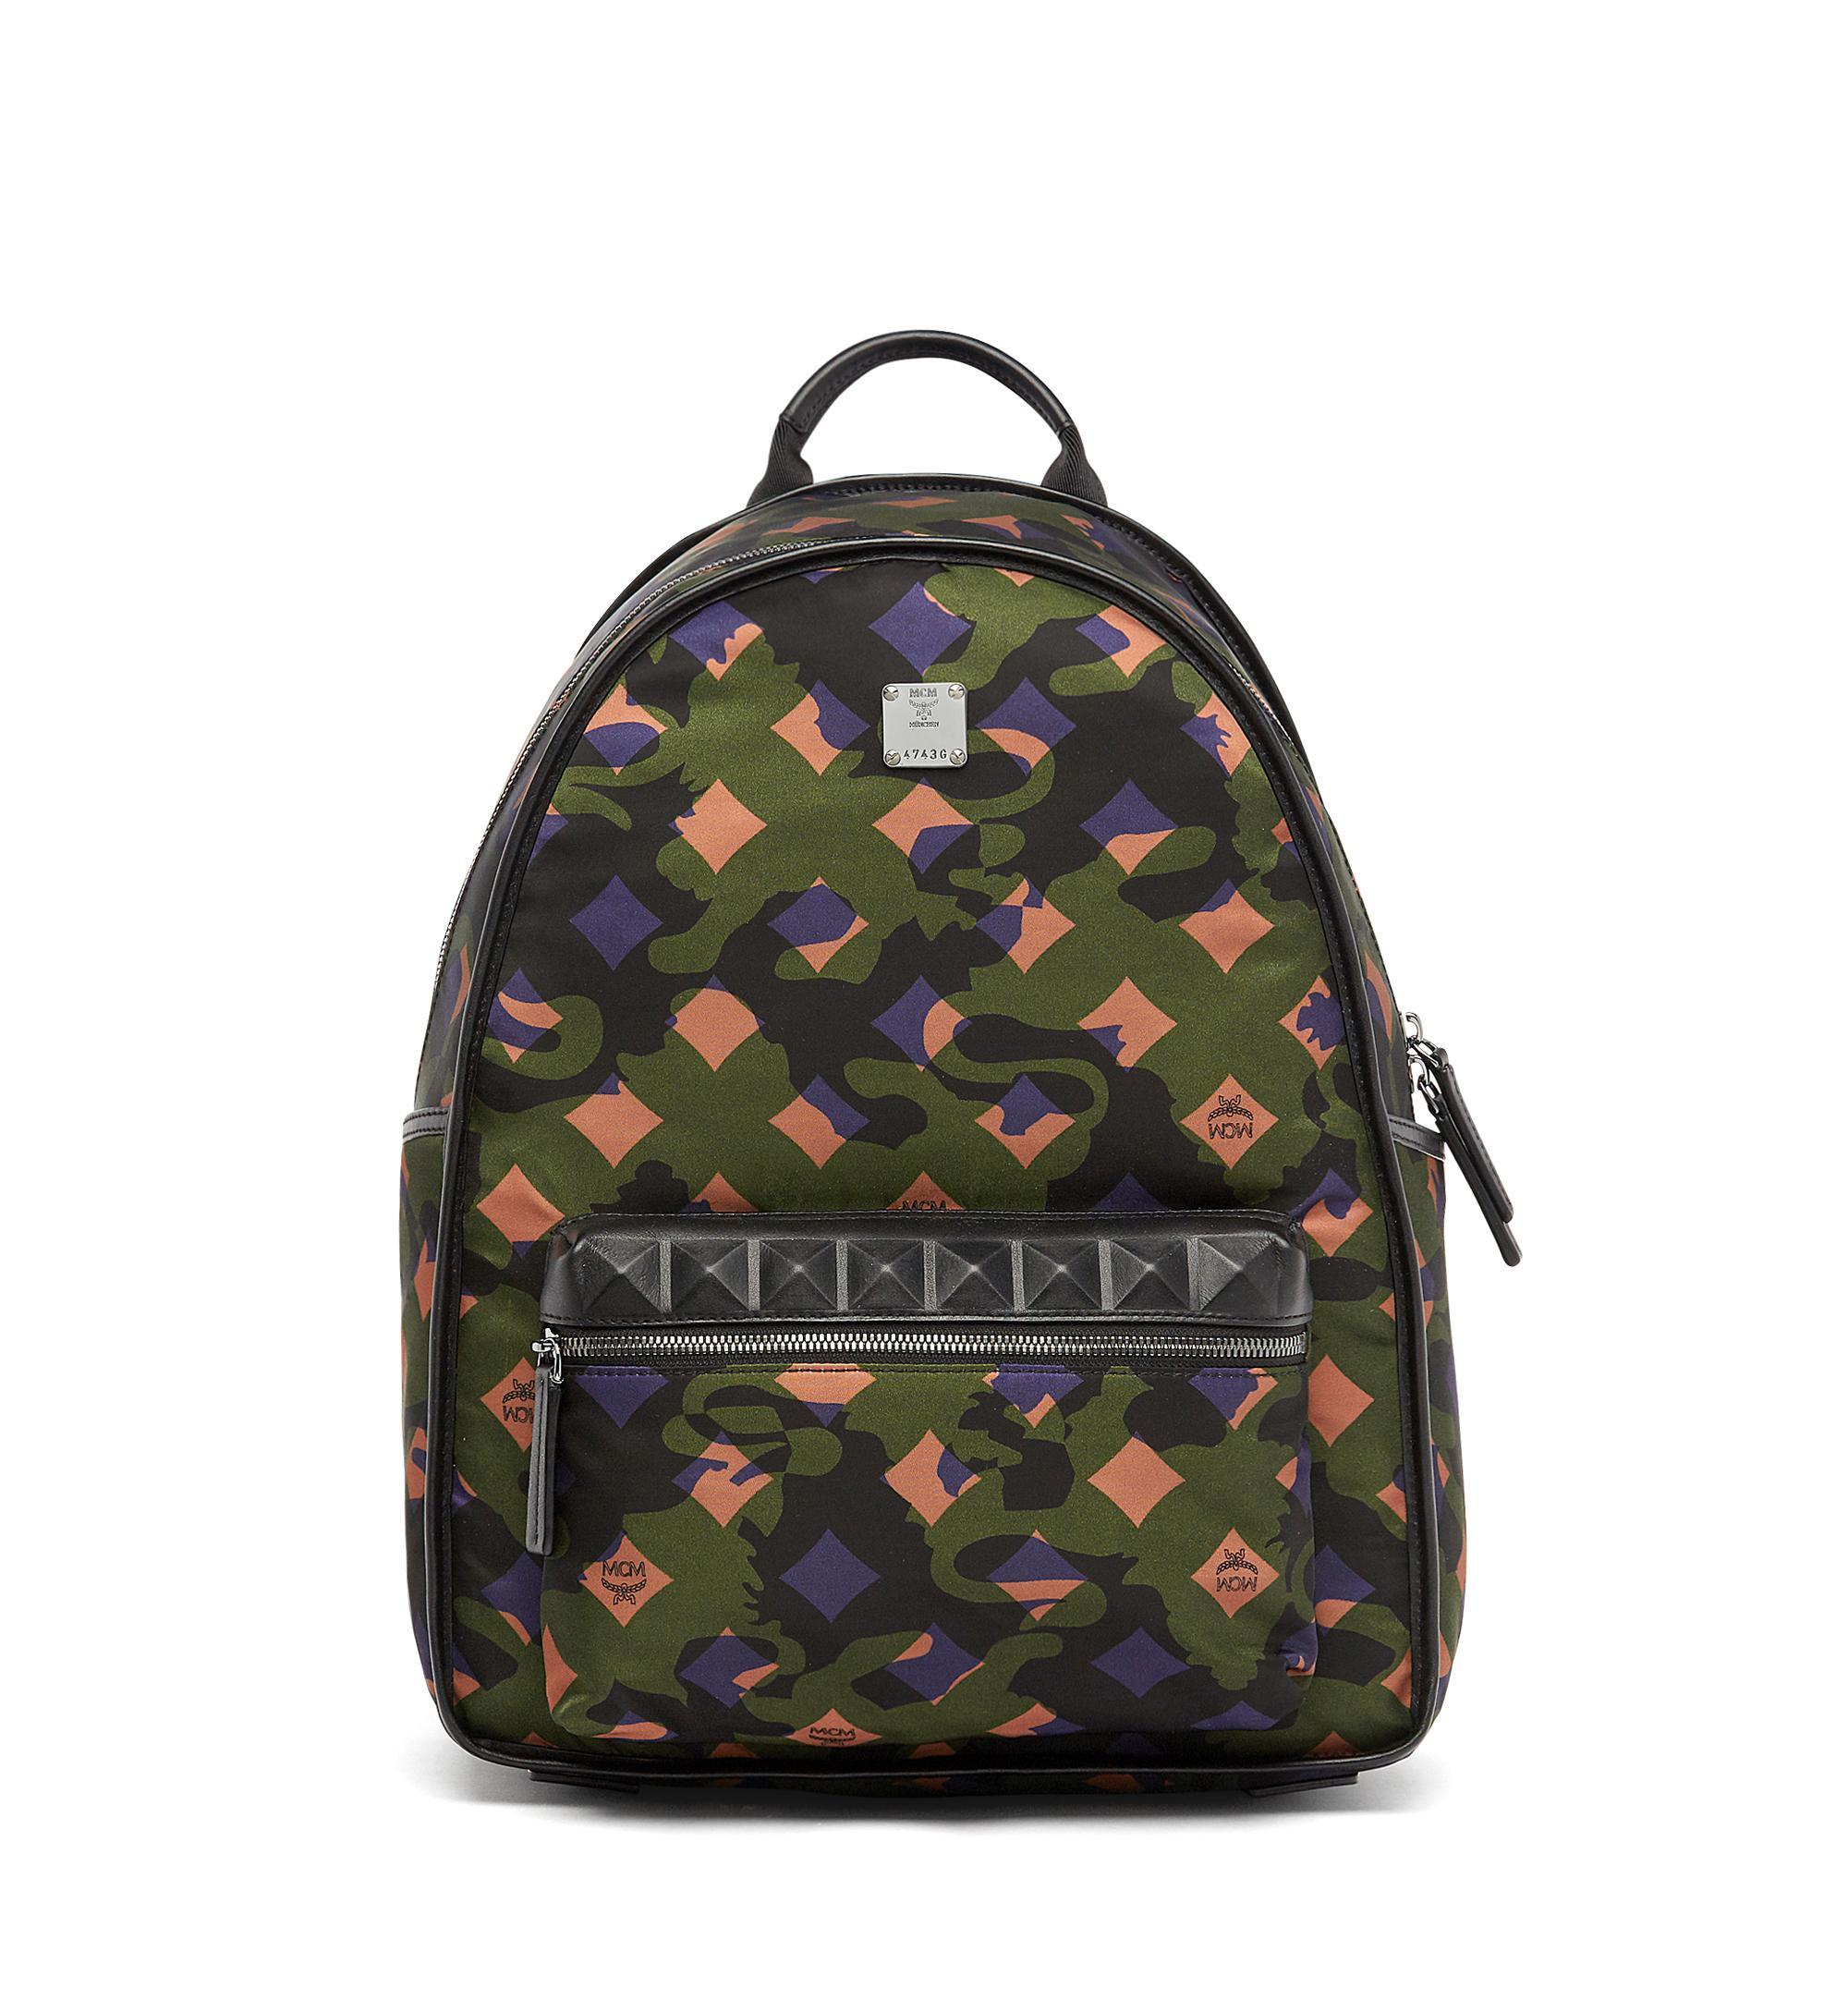 7cb8e787fbfa0 Mcm Dieter Munich Lion Camo Canvas Backpack